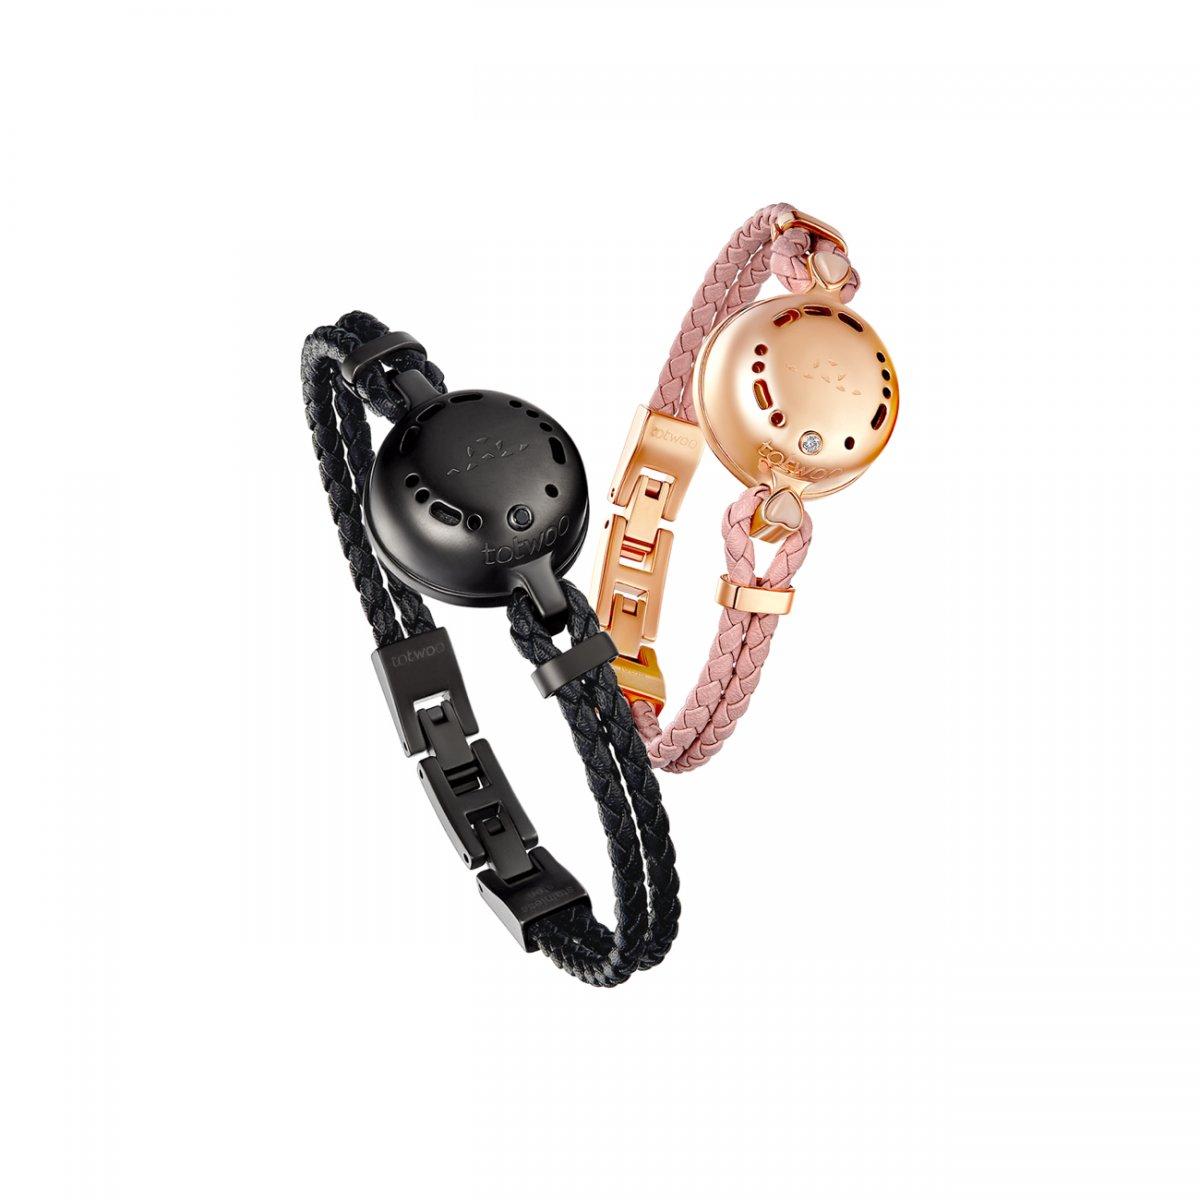 morse code couple bracelet